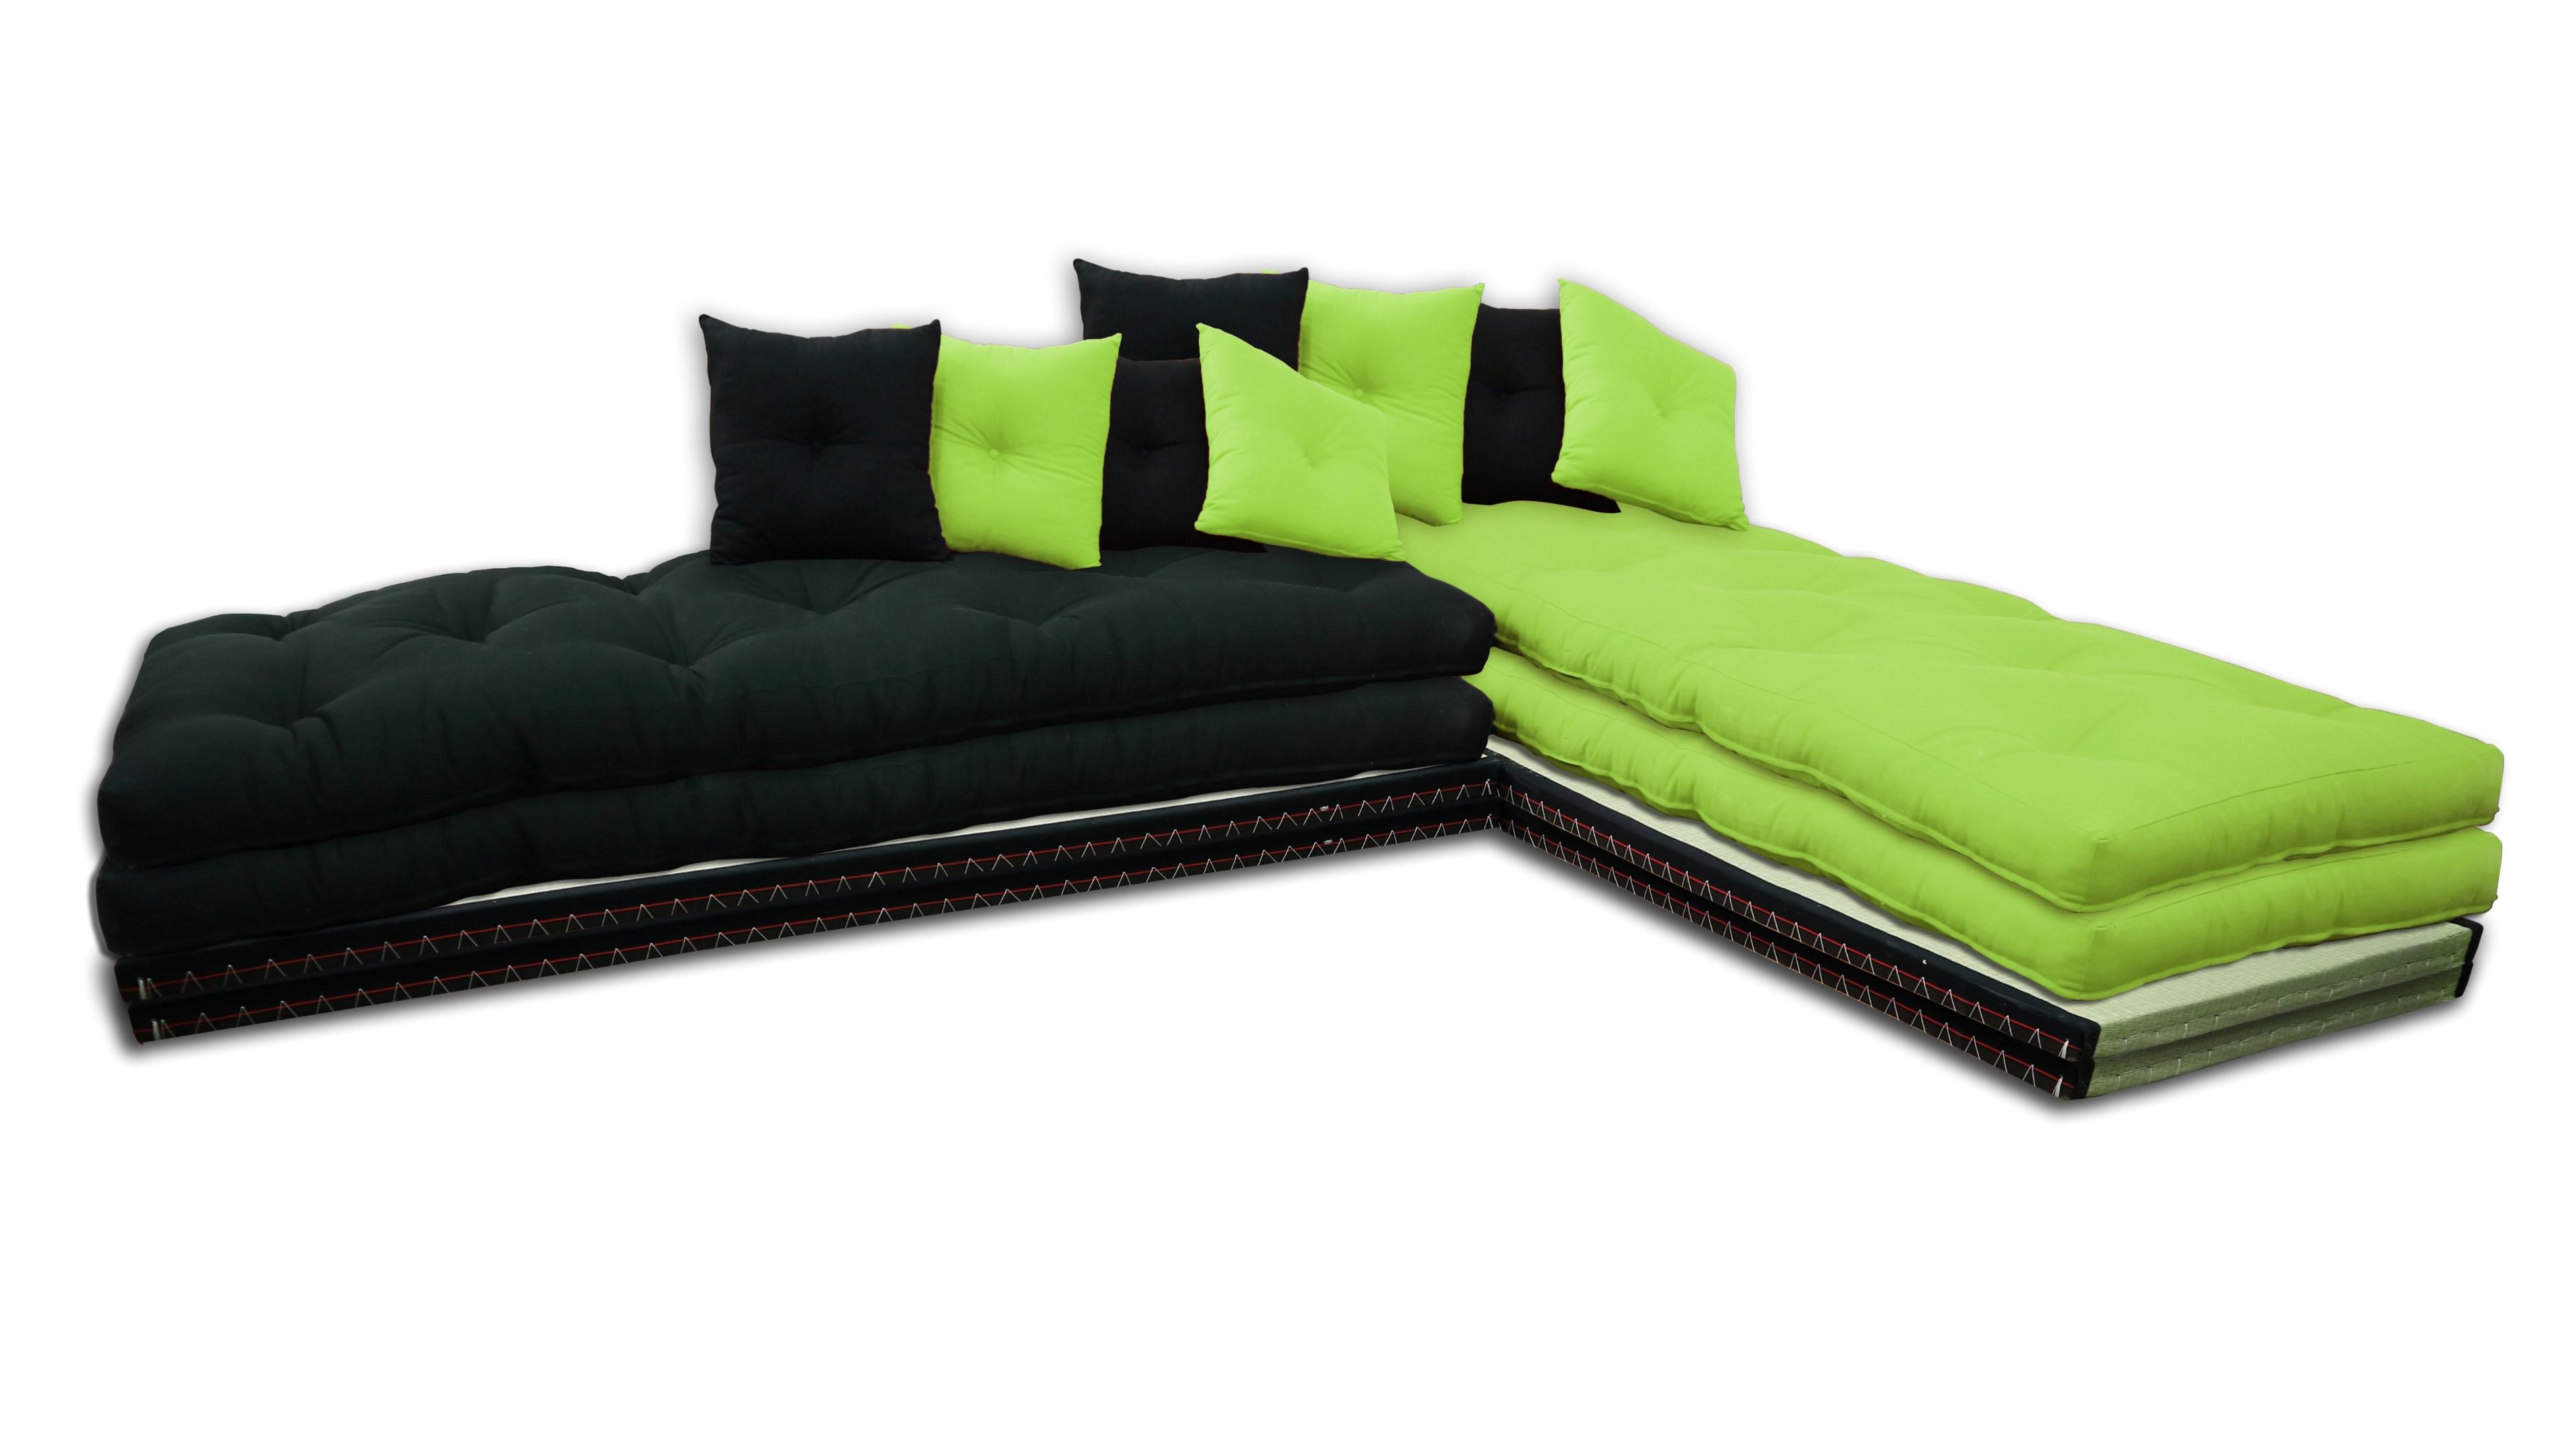 Chaise Lounge Tatami con Futones de color